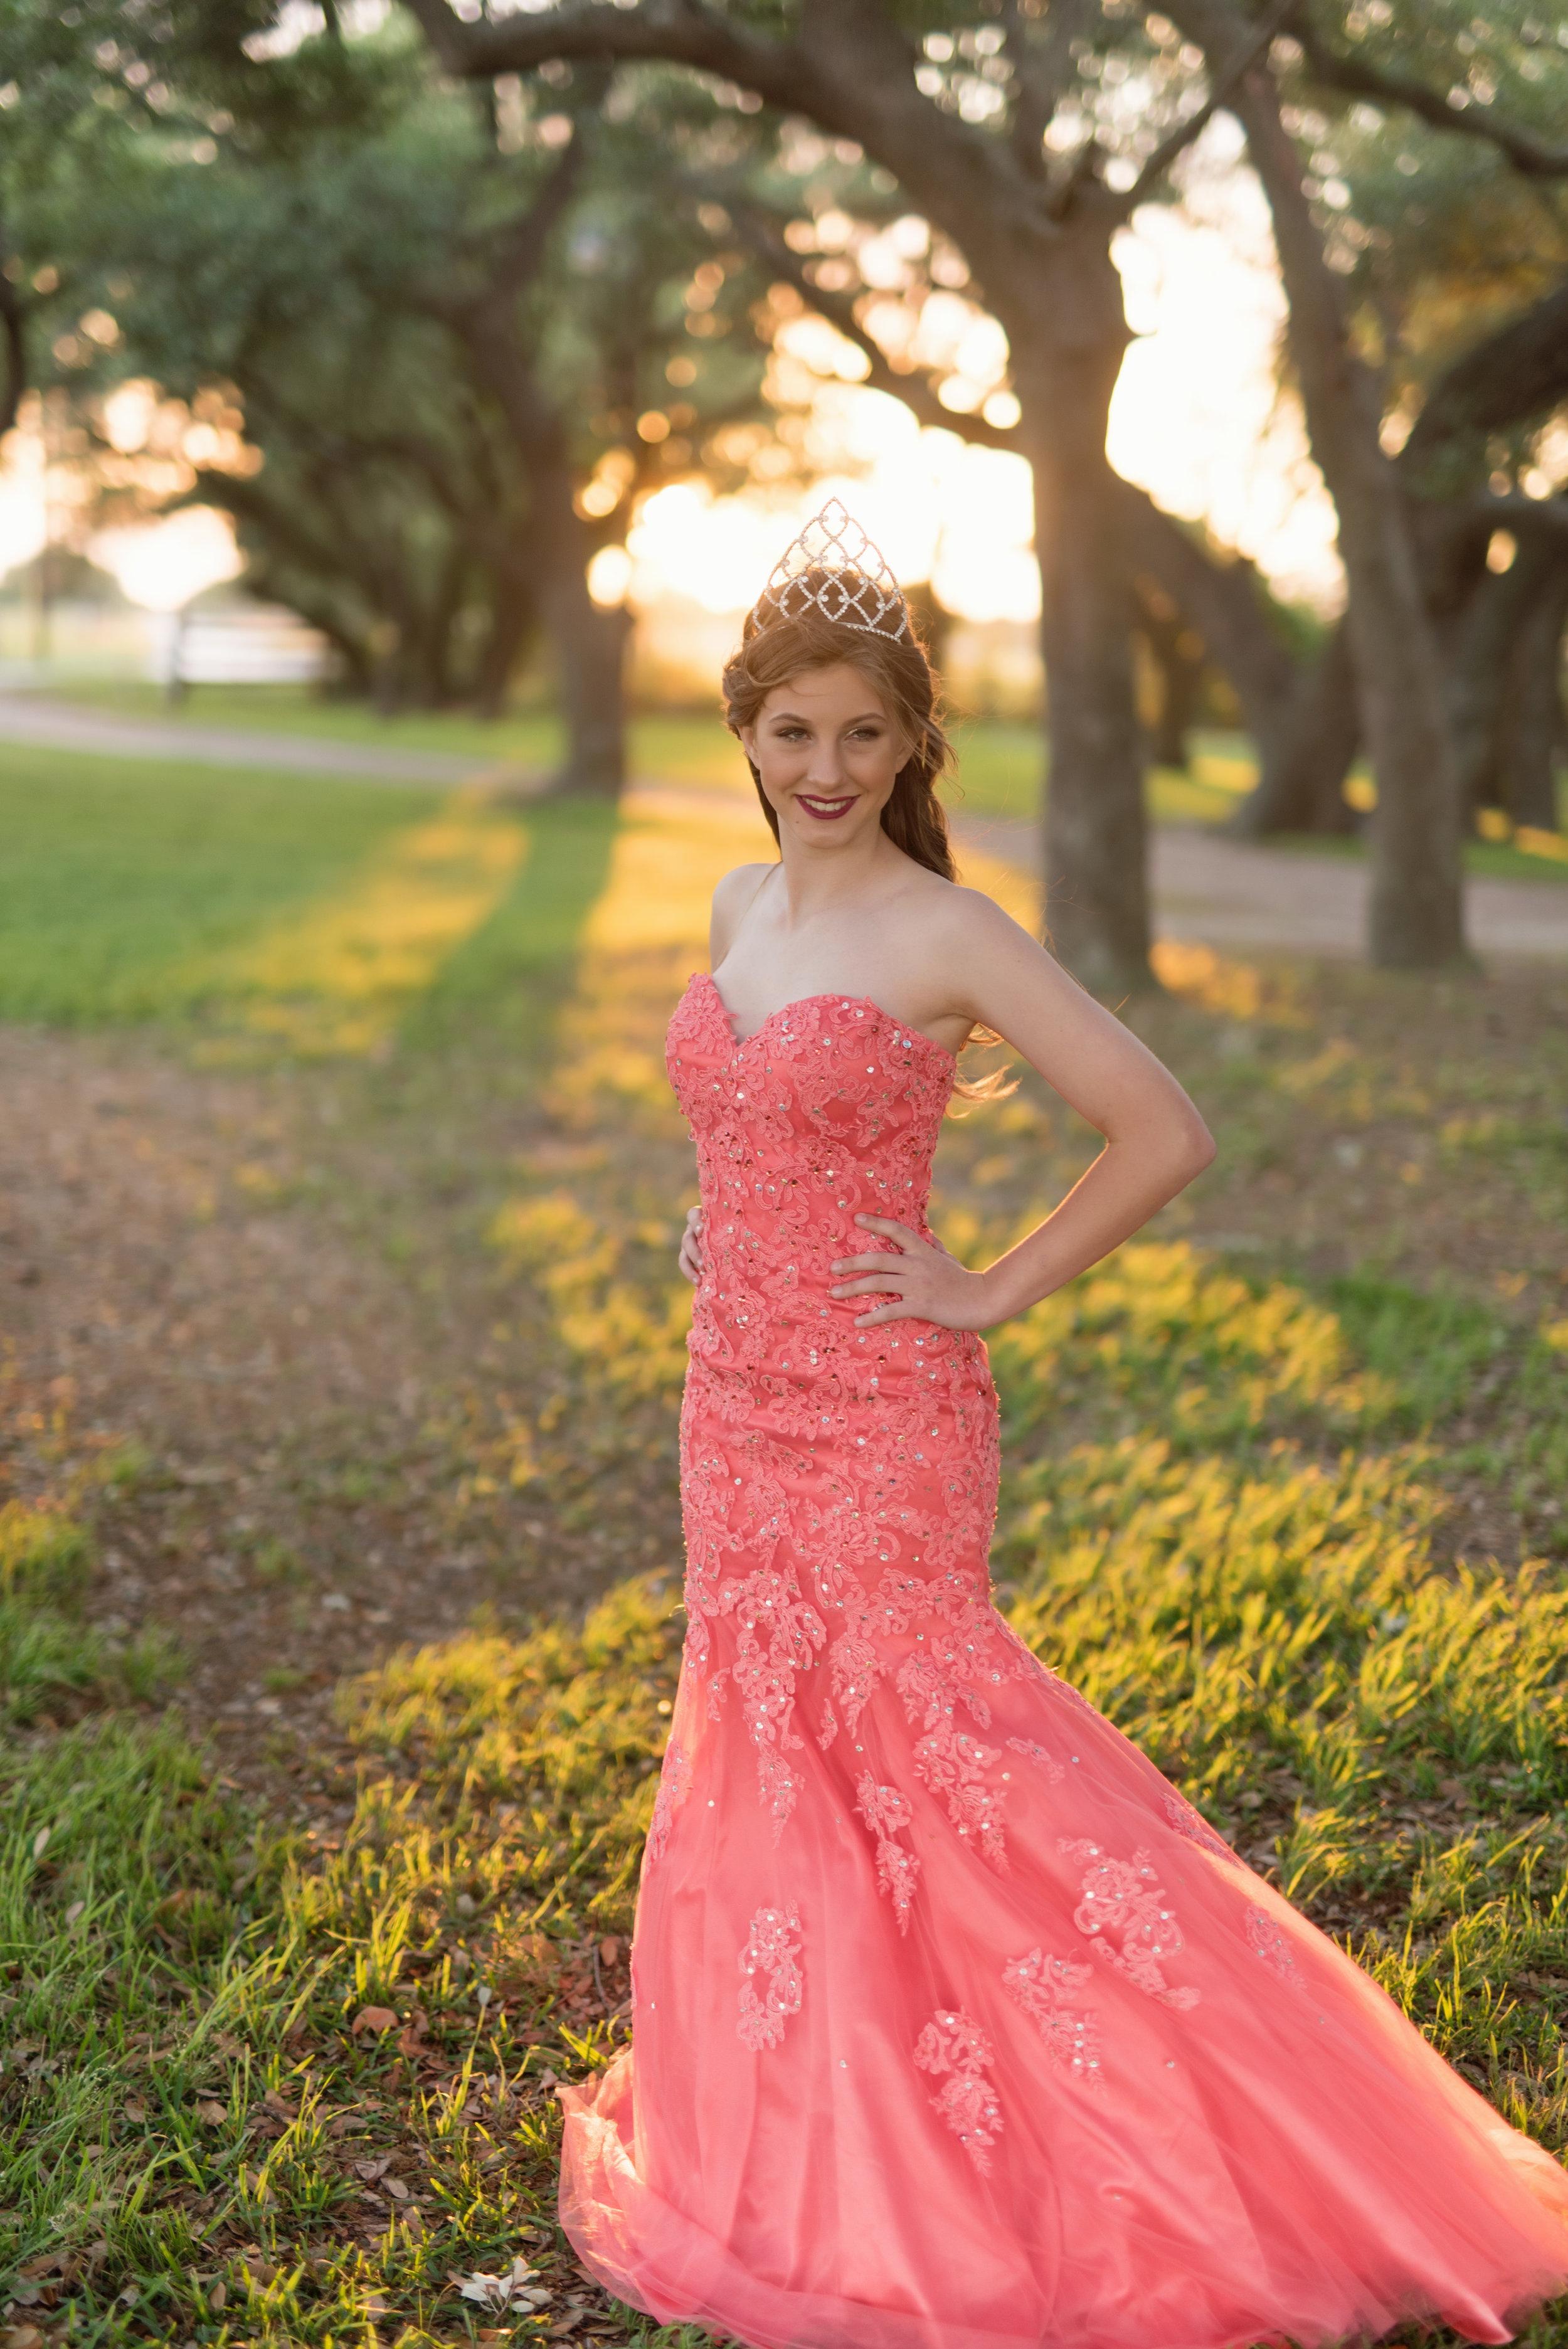 fair queen photos in dress